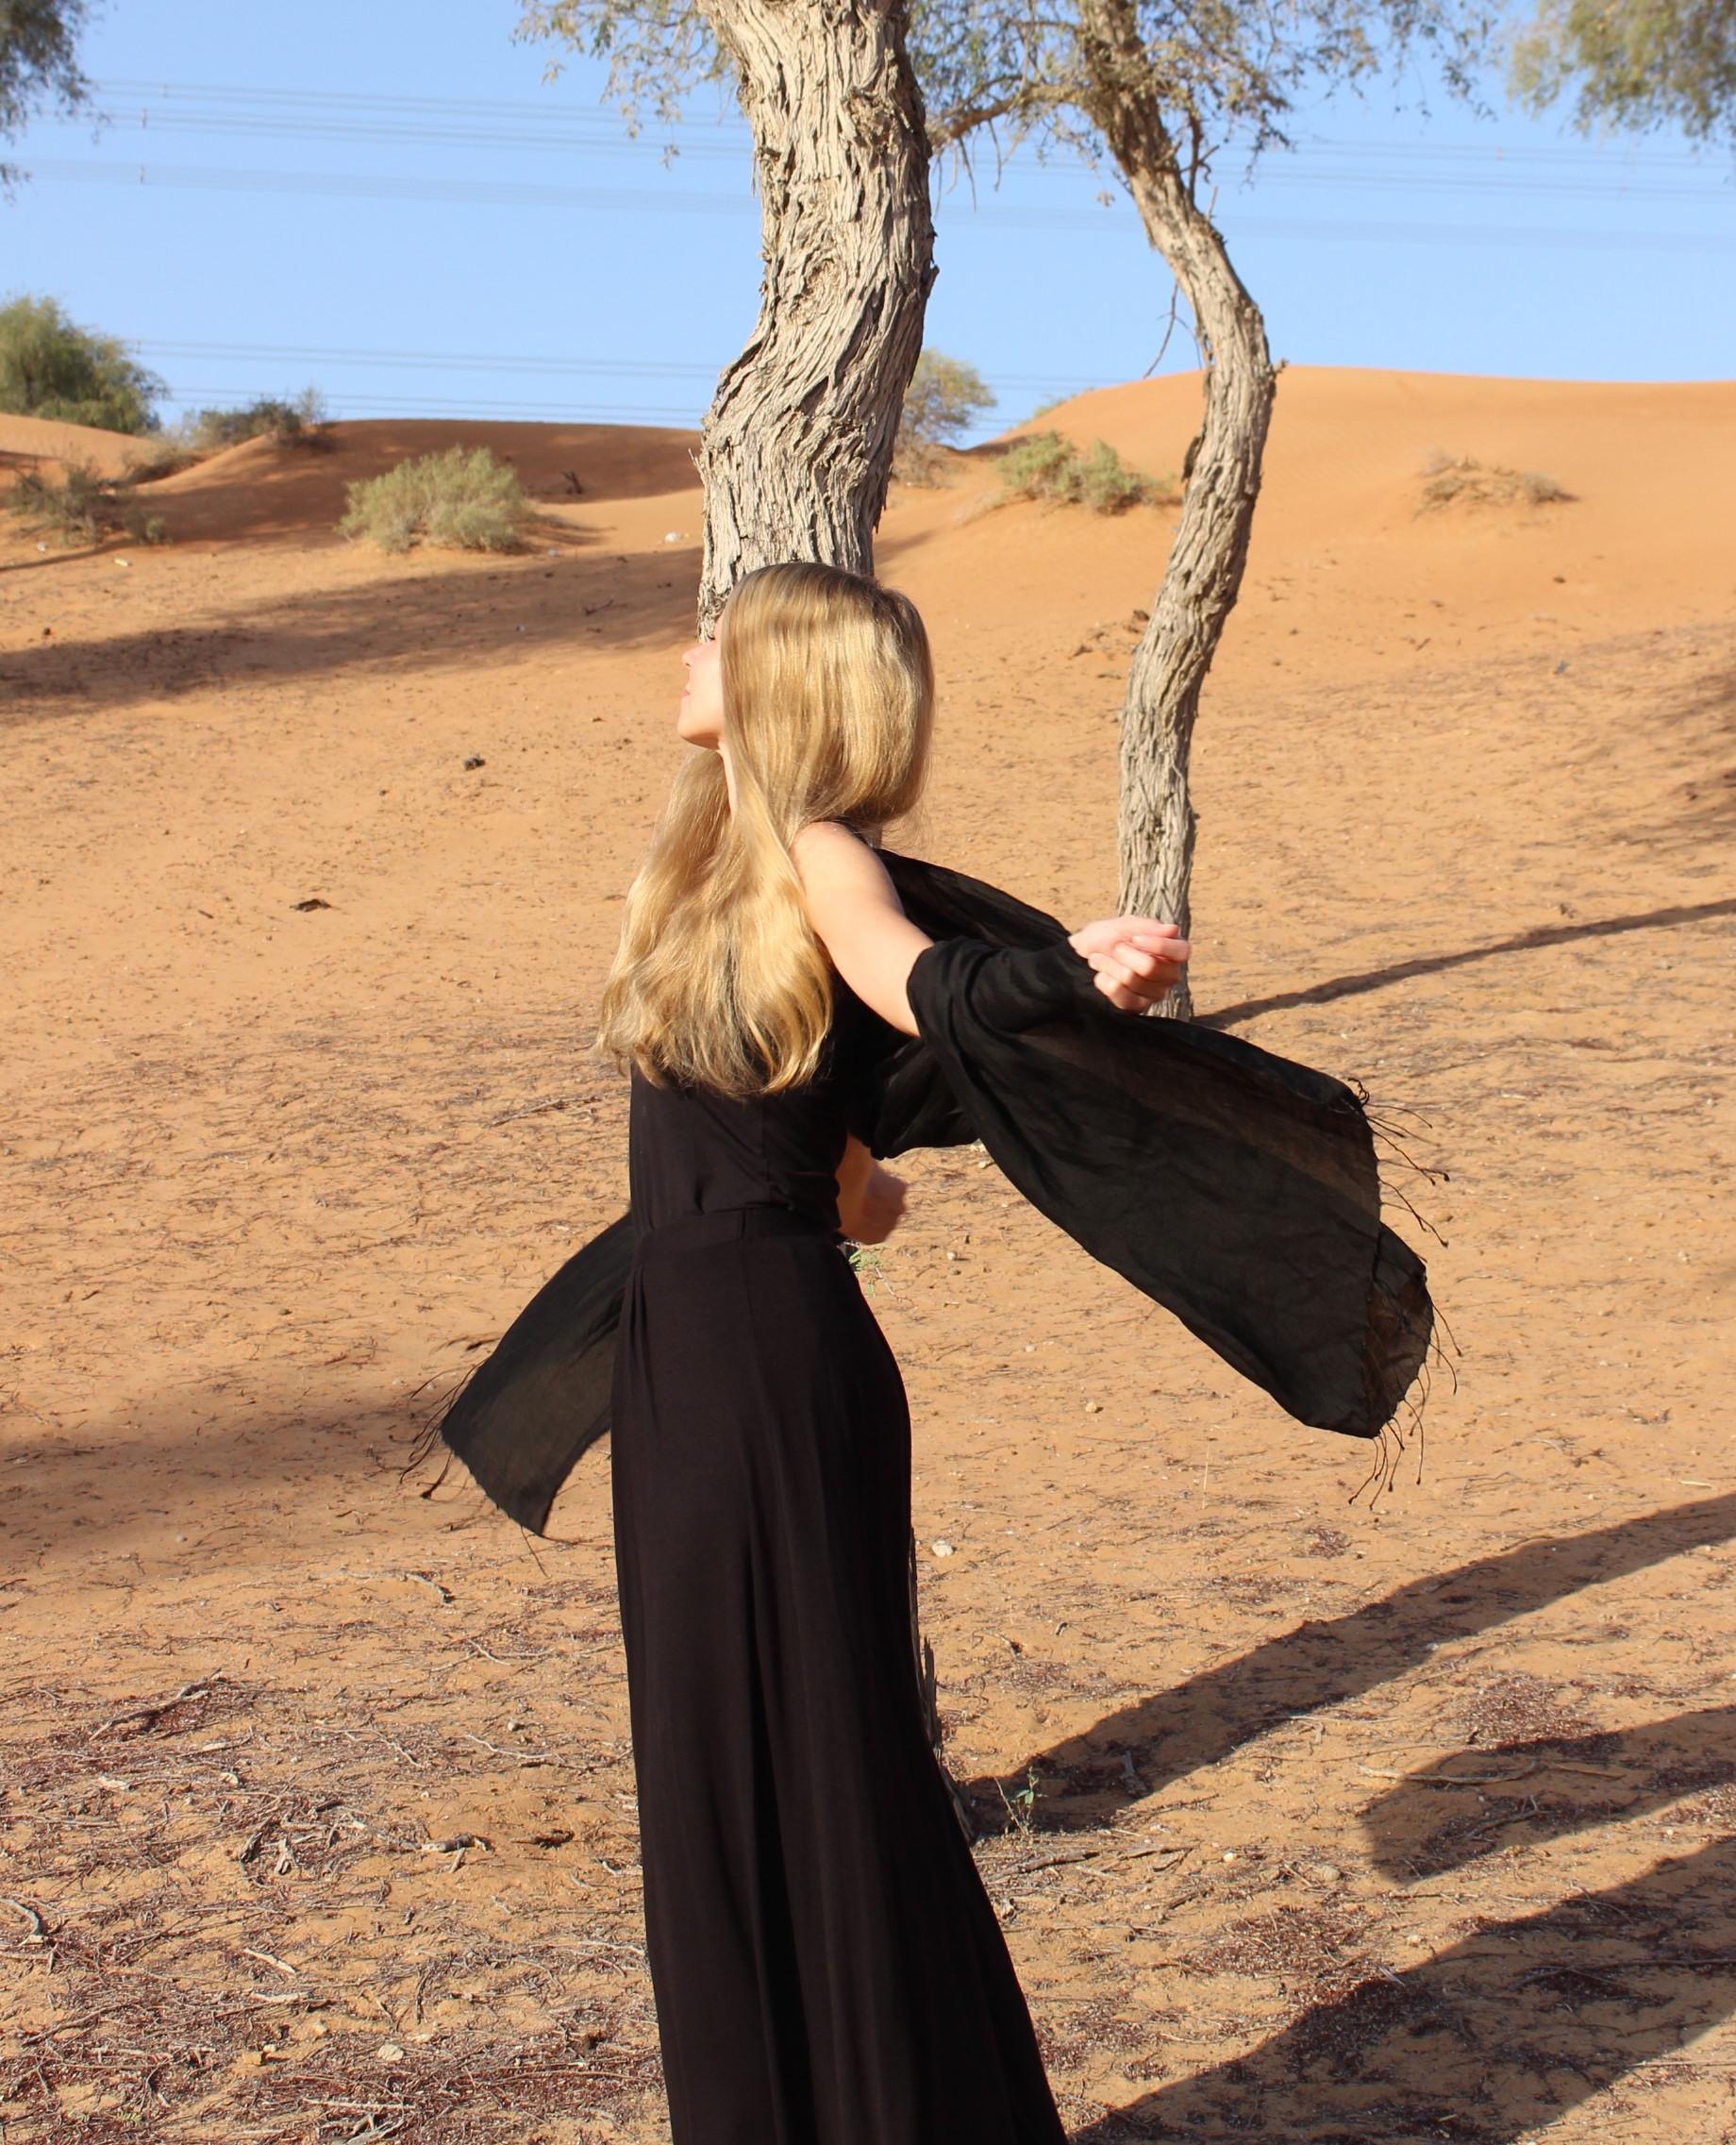 how to dress in dubai? -